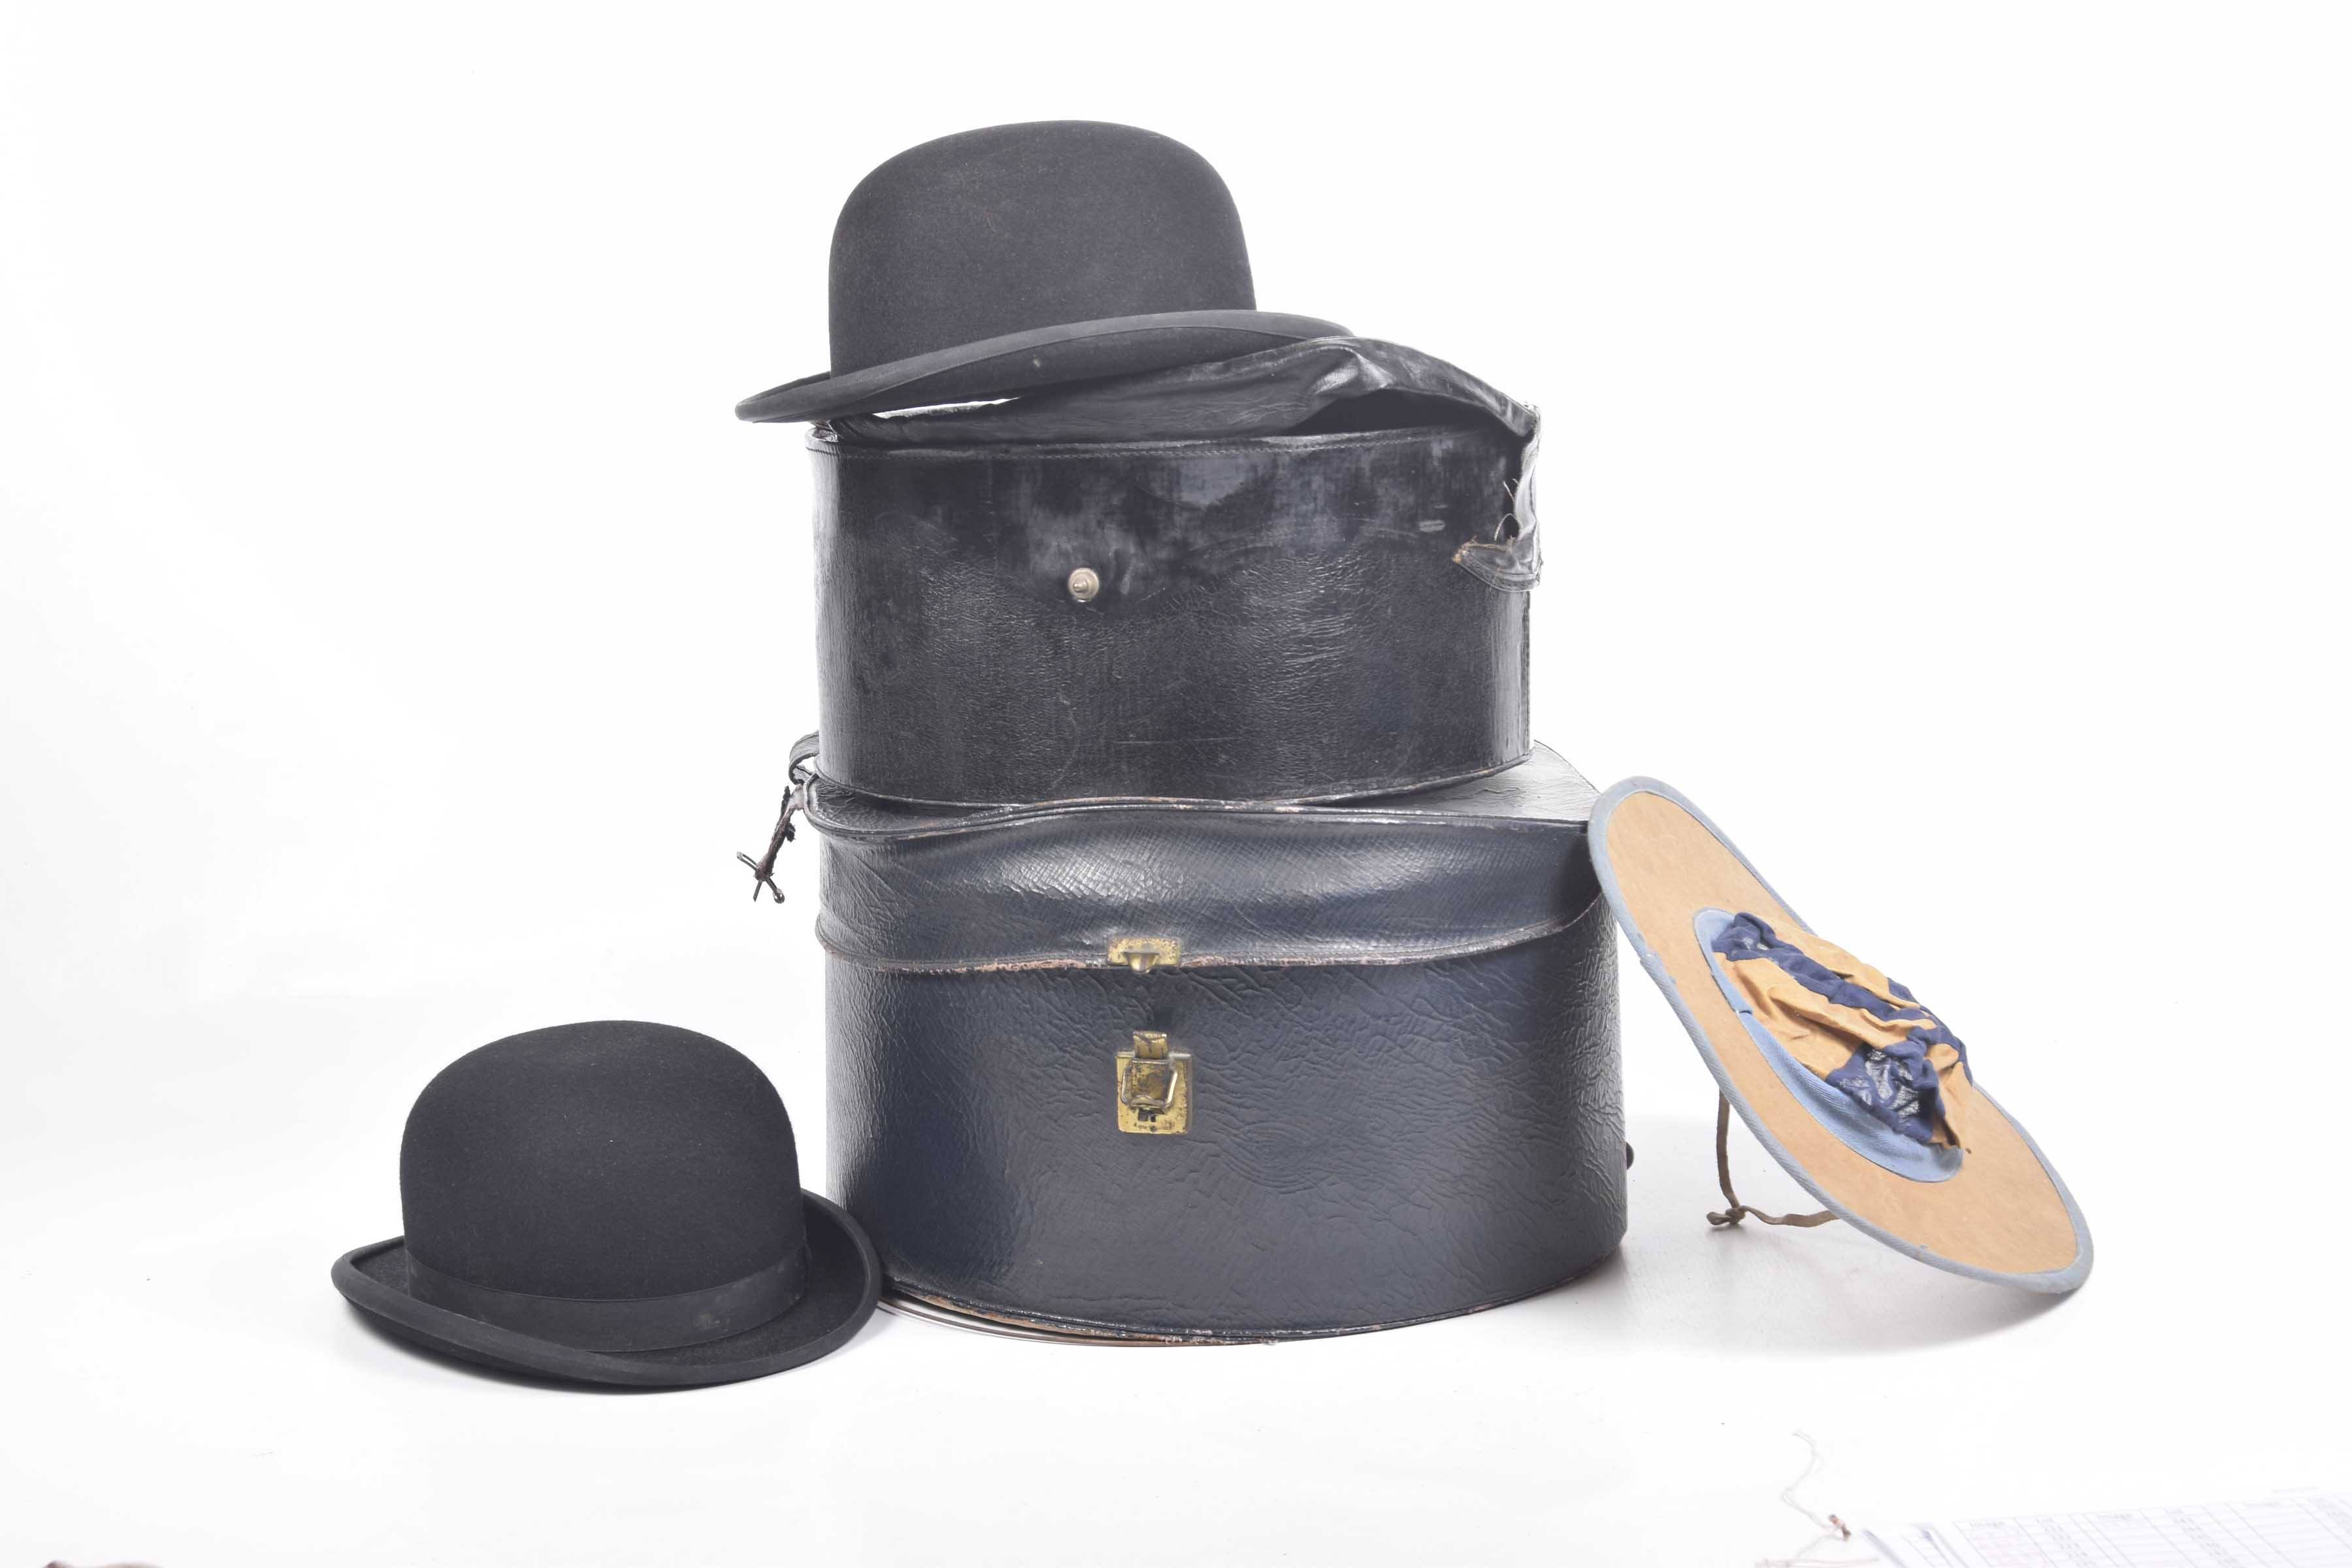 Lot 253 - Two hunting bowler hats d8854e8fa06